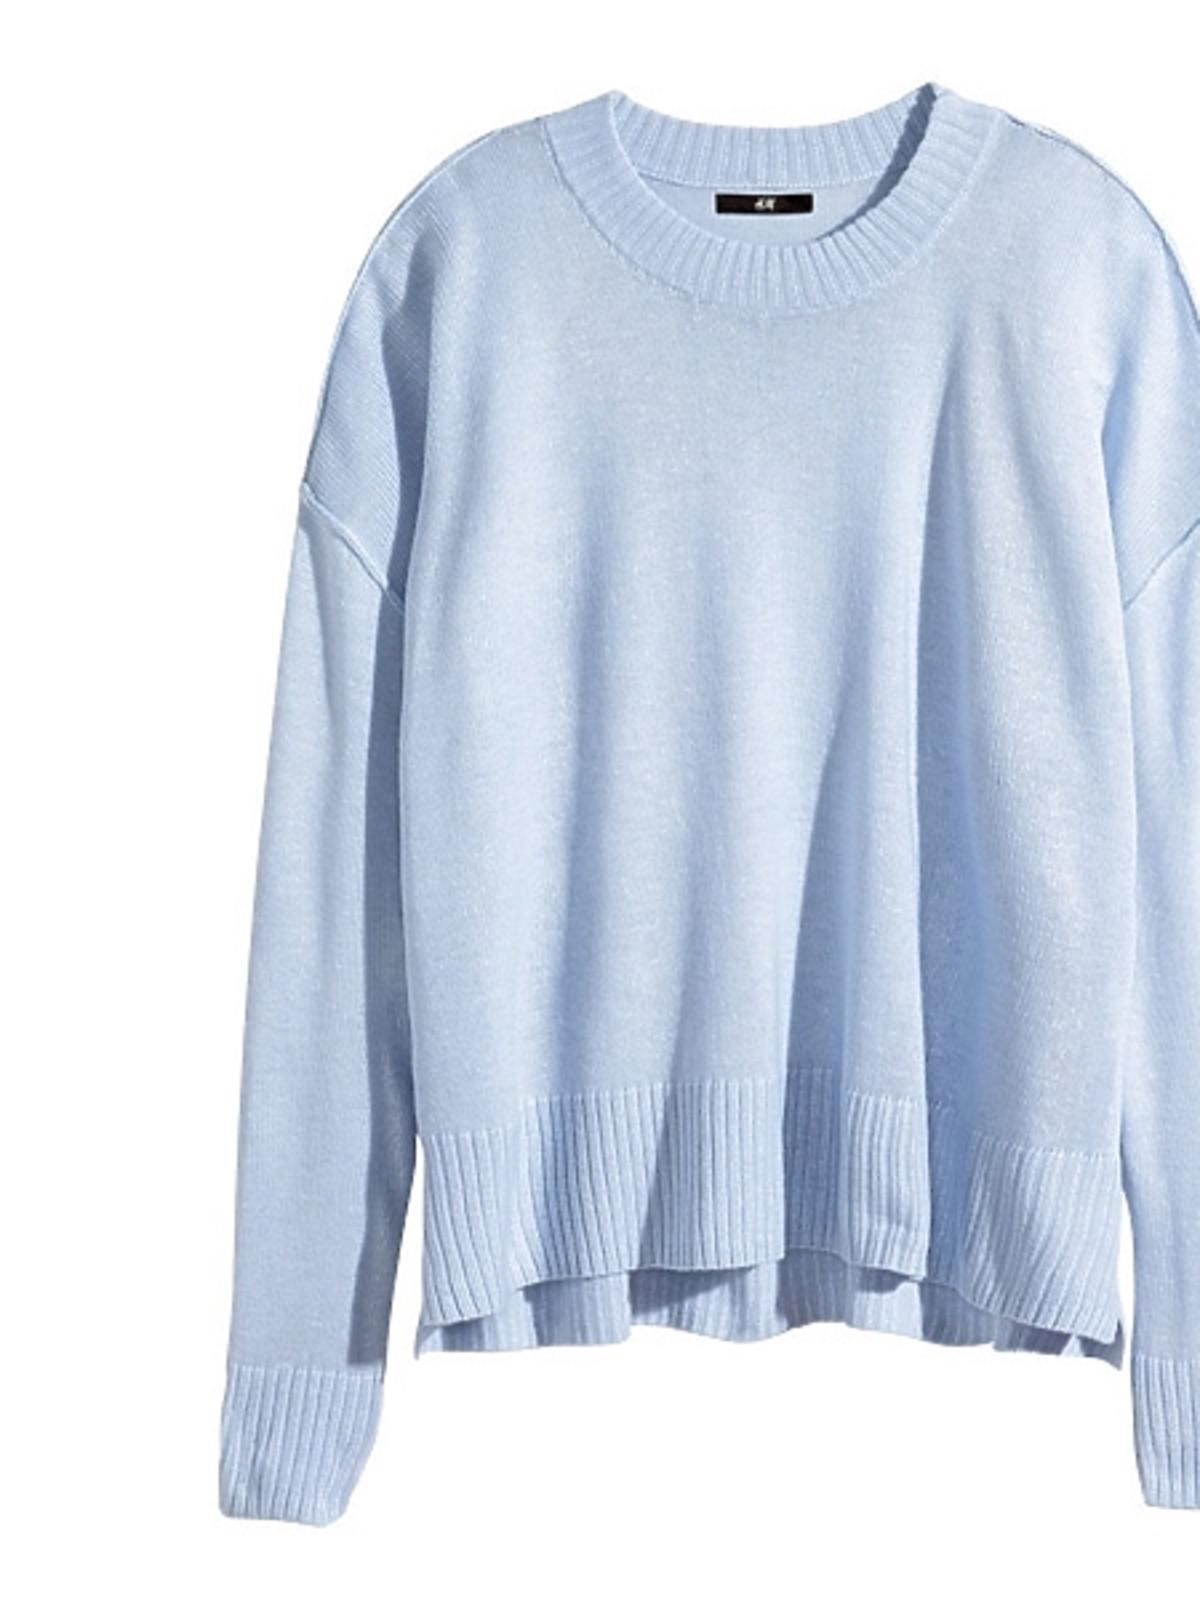 Niebieski sweter H&M, cena